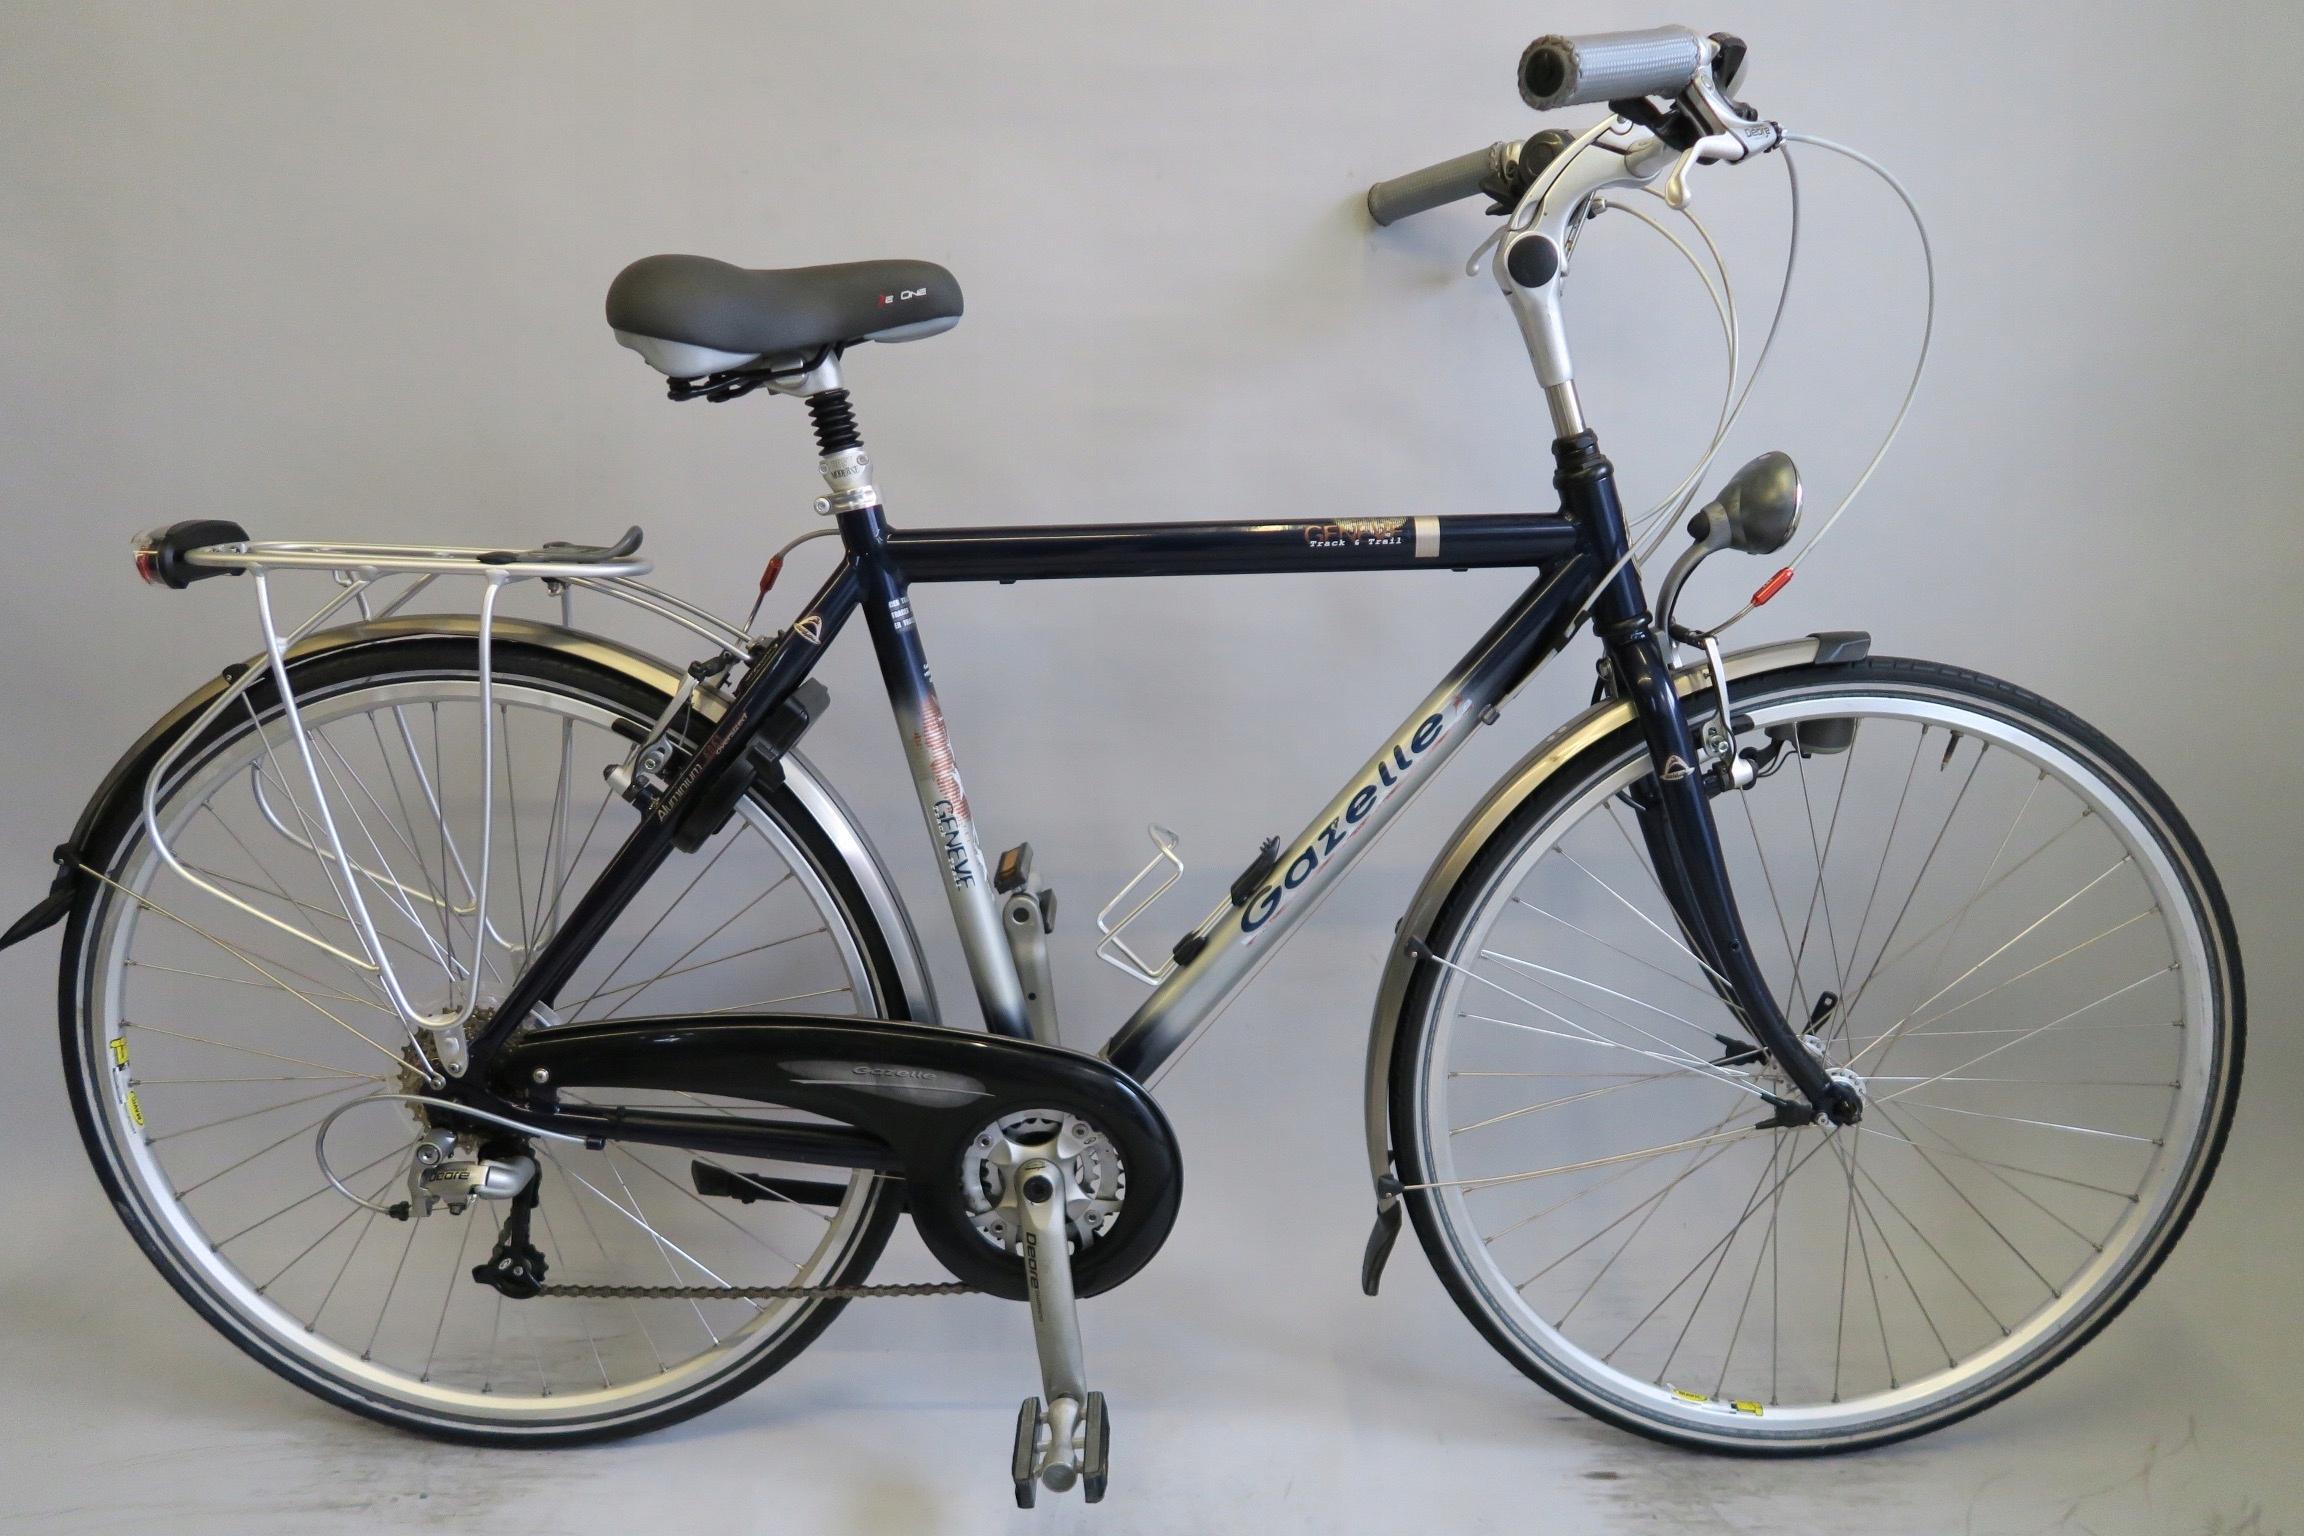 Wygodny rower holenderski Gazelle Geneve Deore